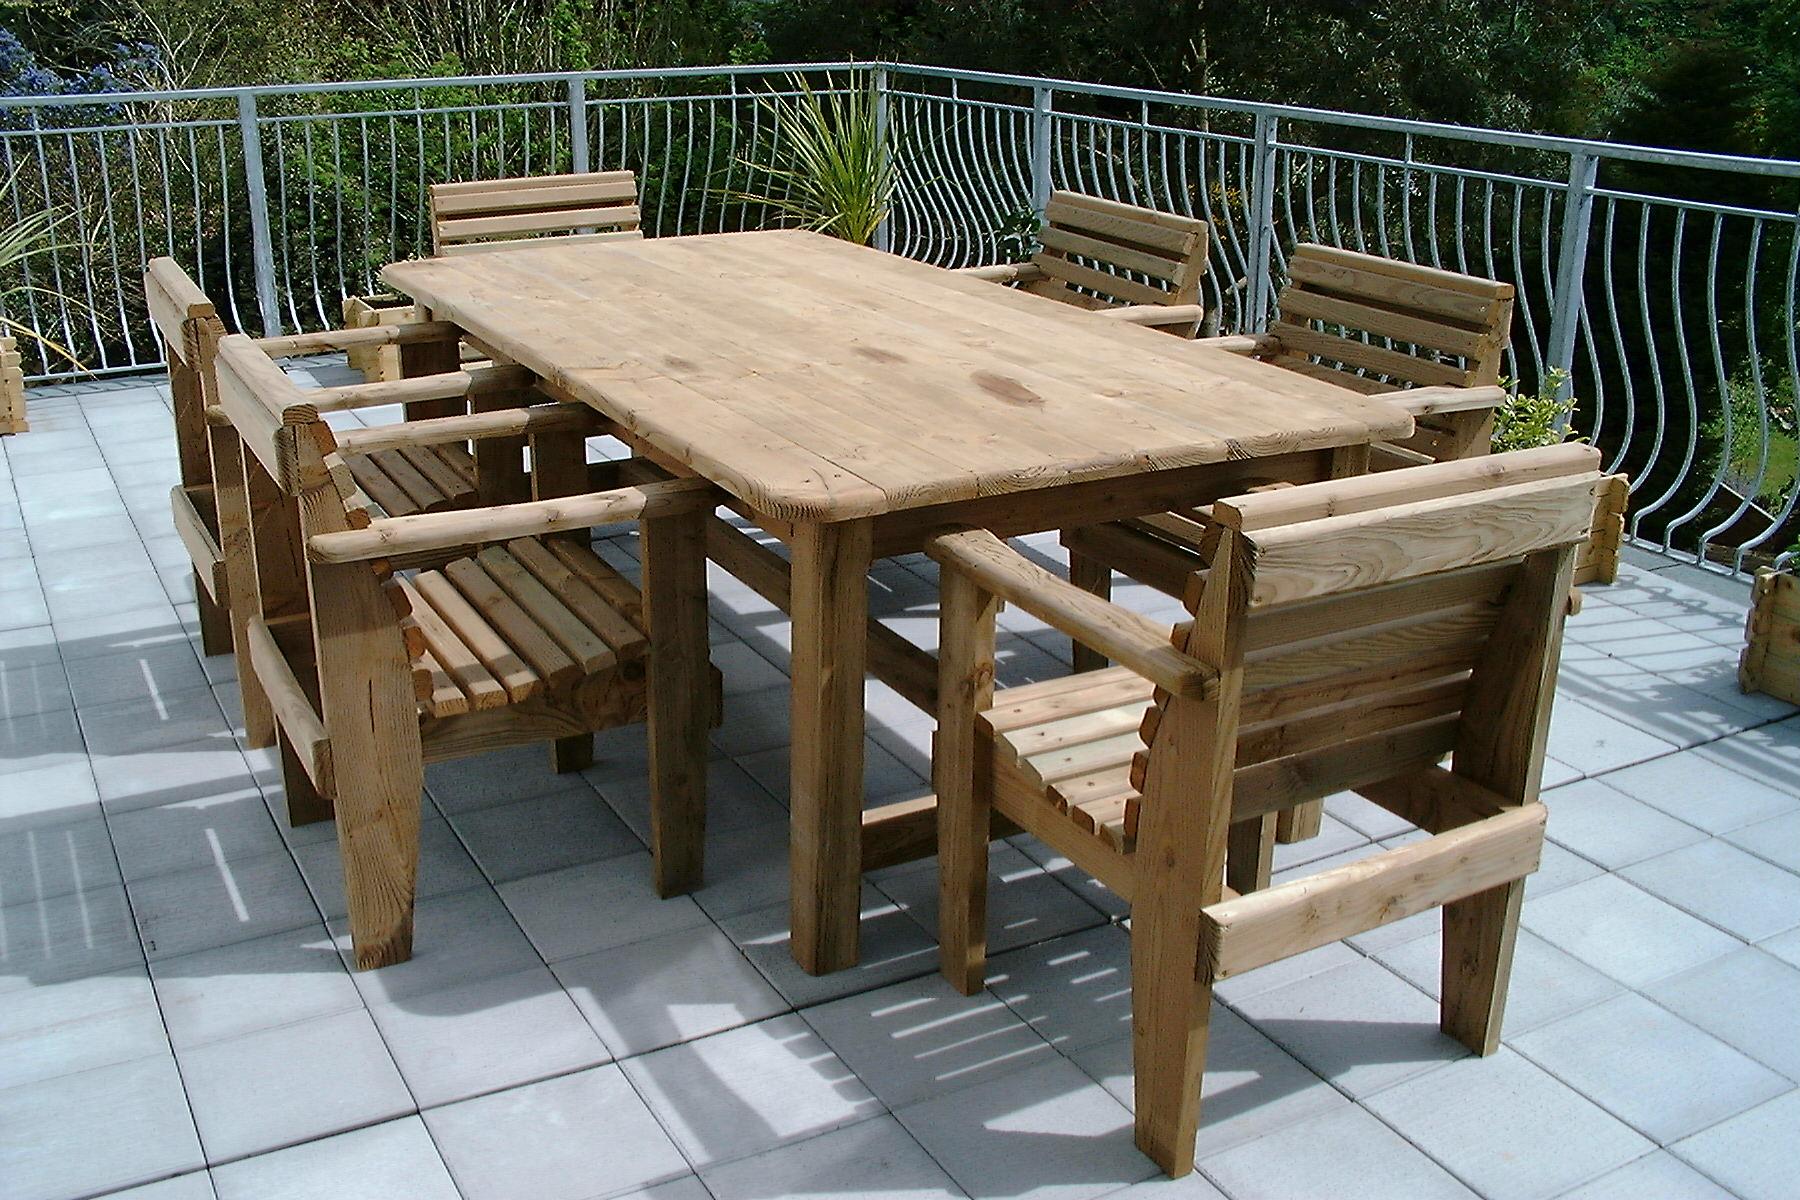 garden table and chairs garden furniture @ bq diy at bq DIAQEDH